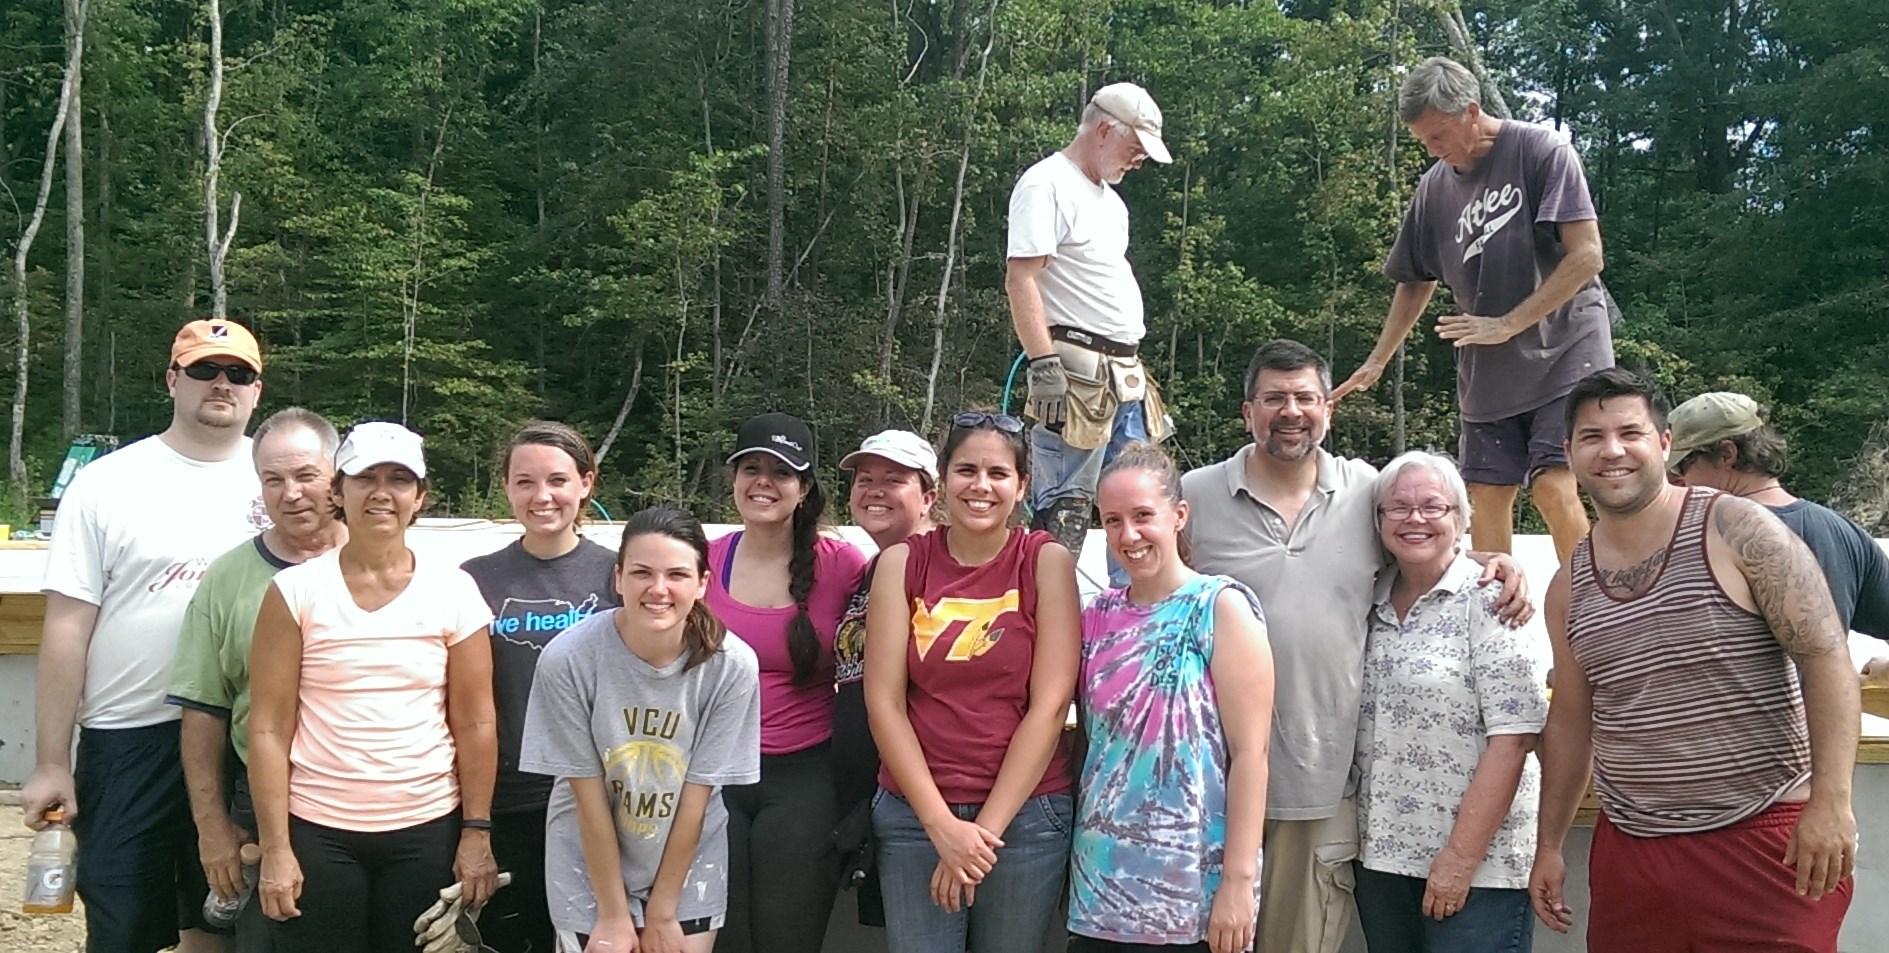 Crosstrain at Habitat for Humanity - Aug 30 2014